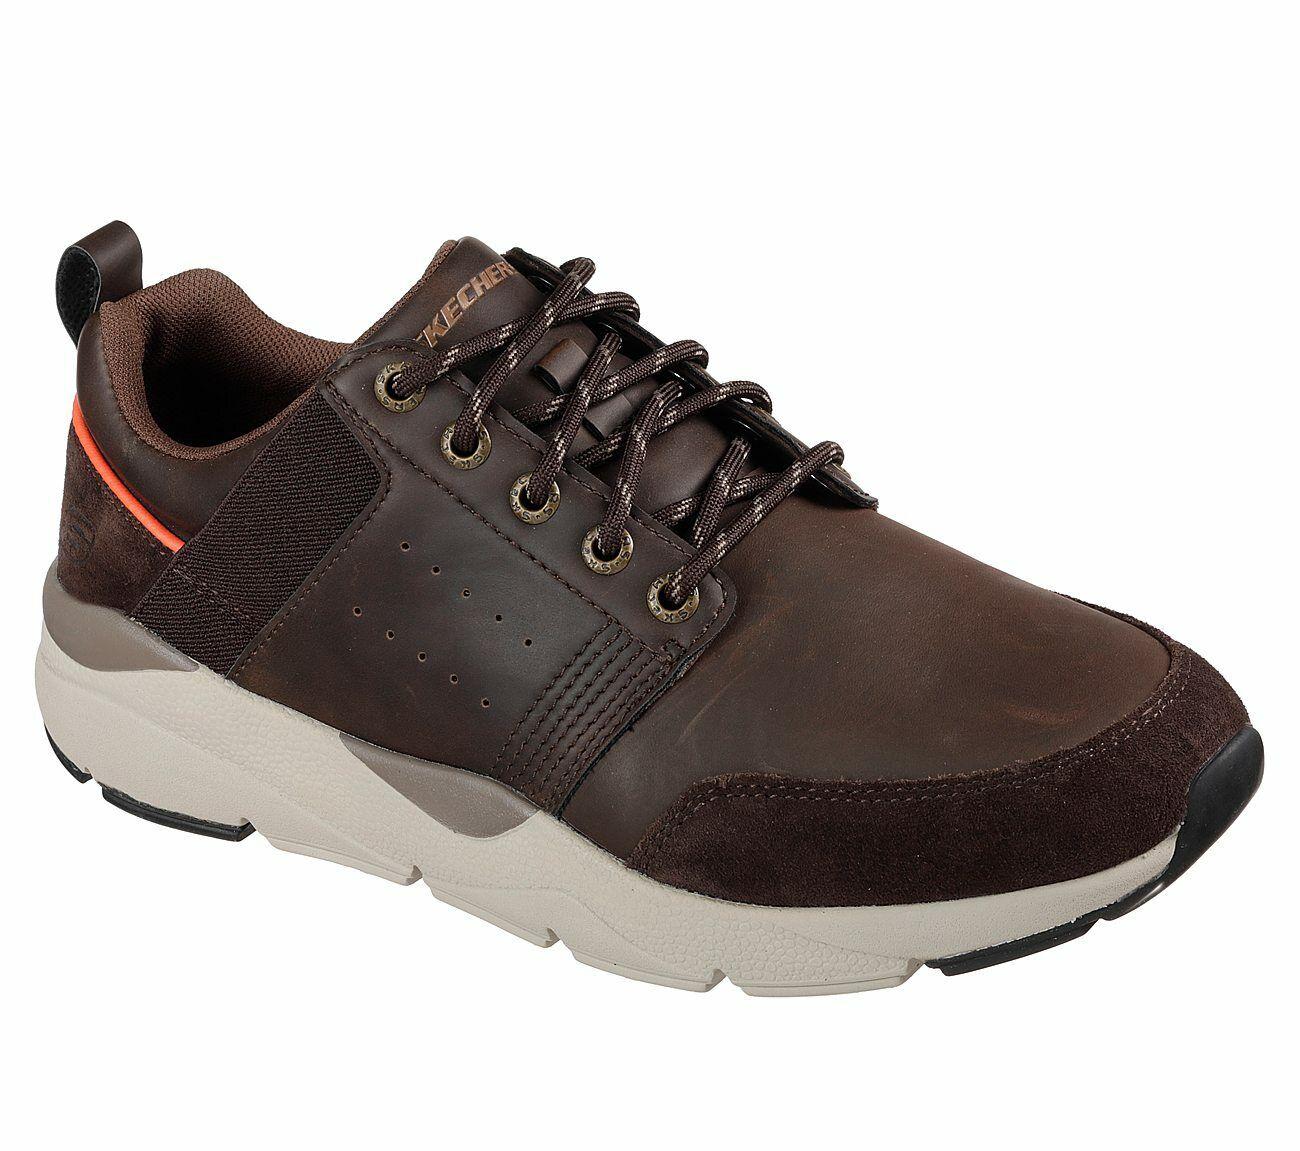 Details zu NEU SKECHERS Herren Sneakers RECENT MEROSO Braun